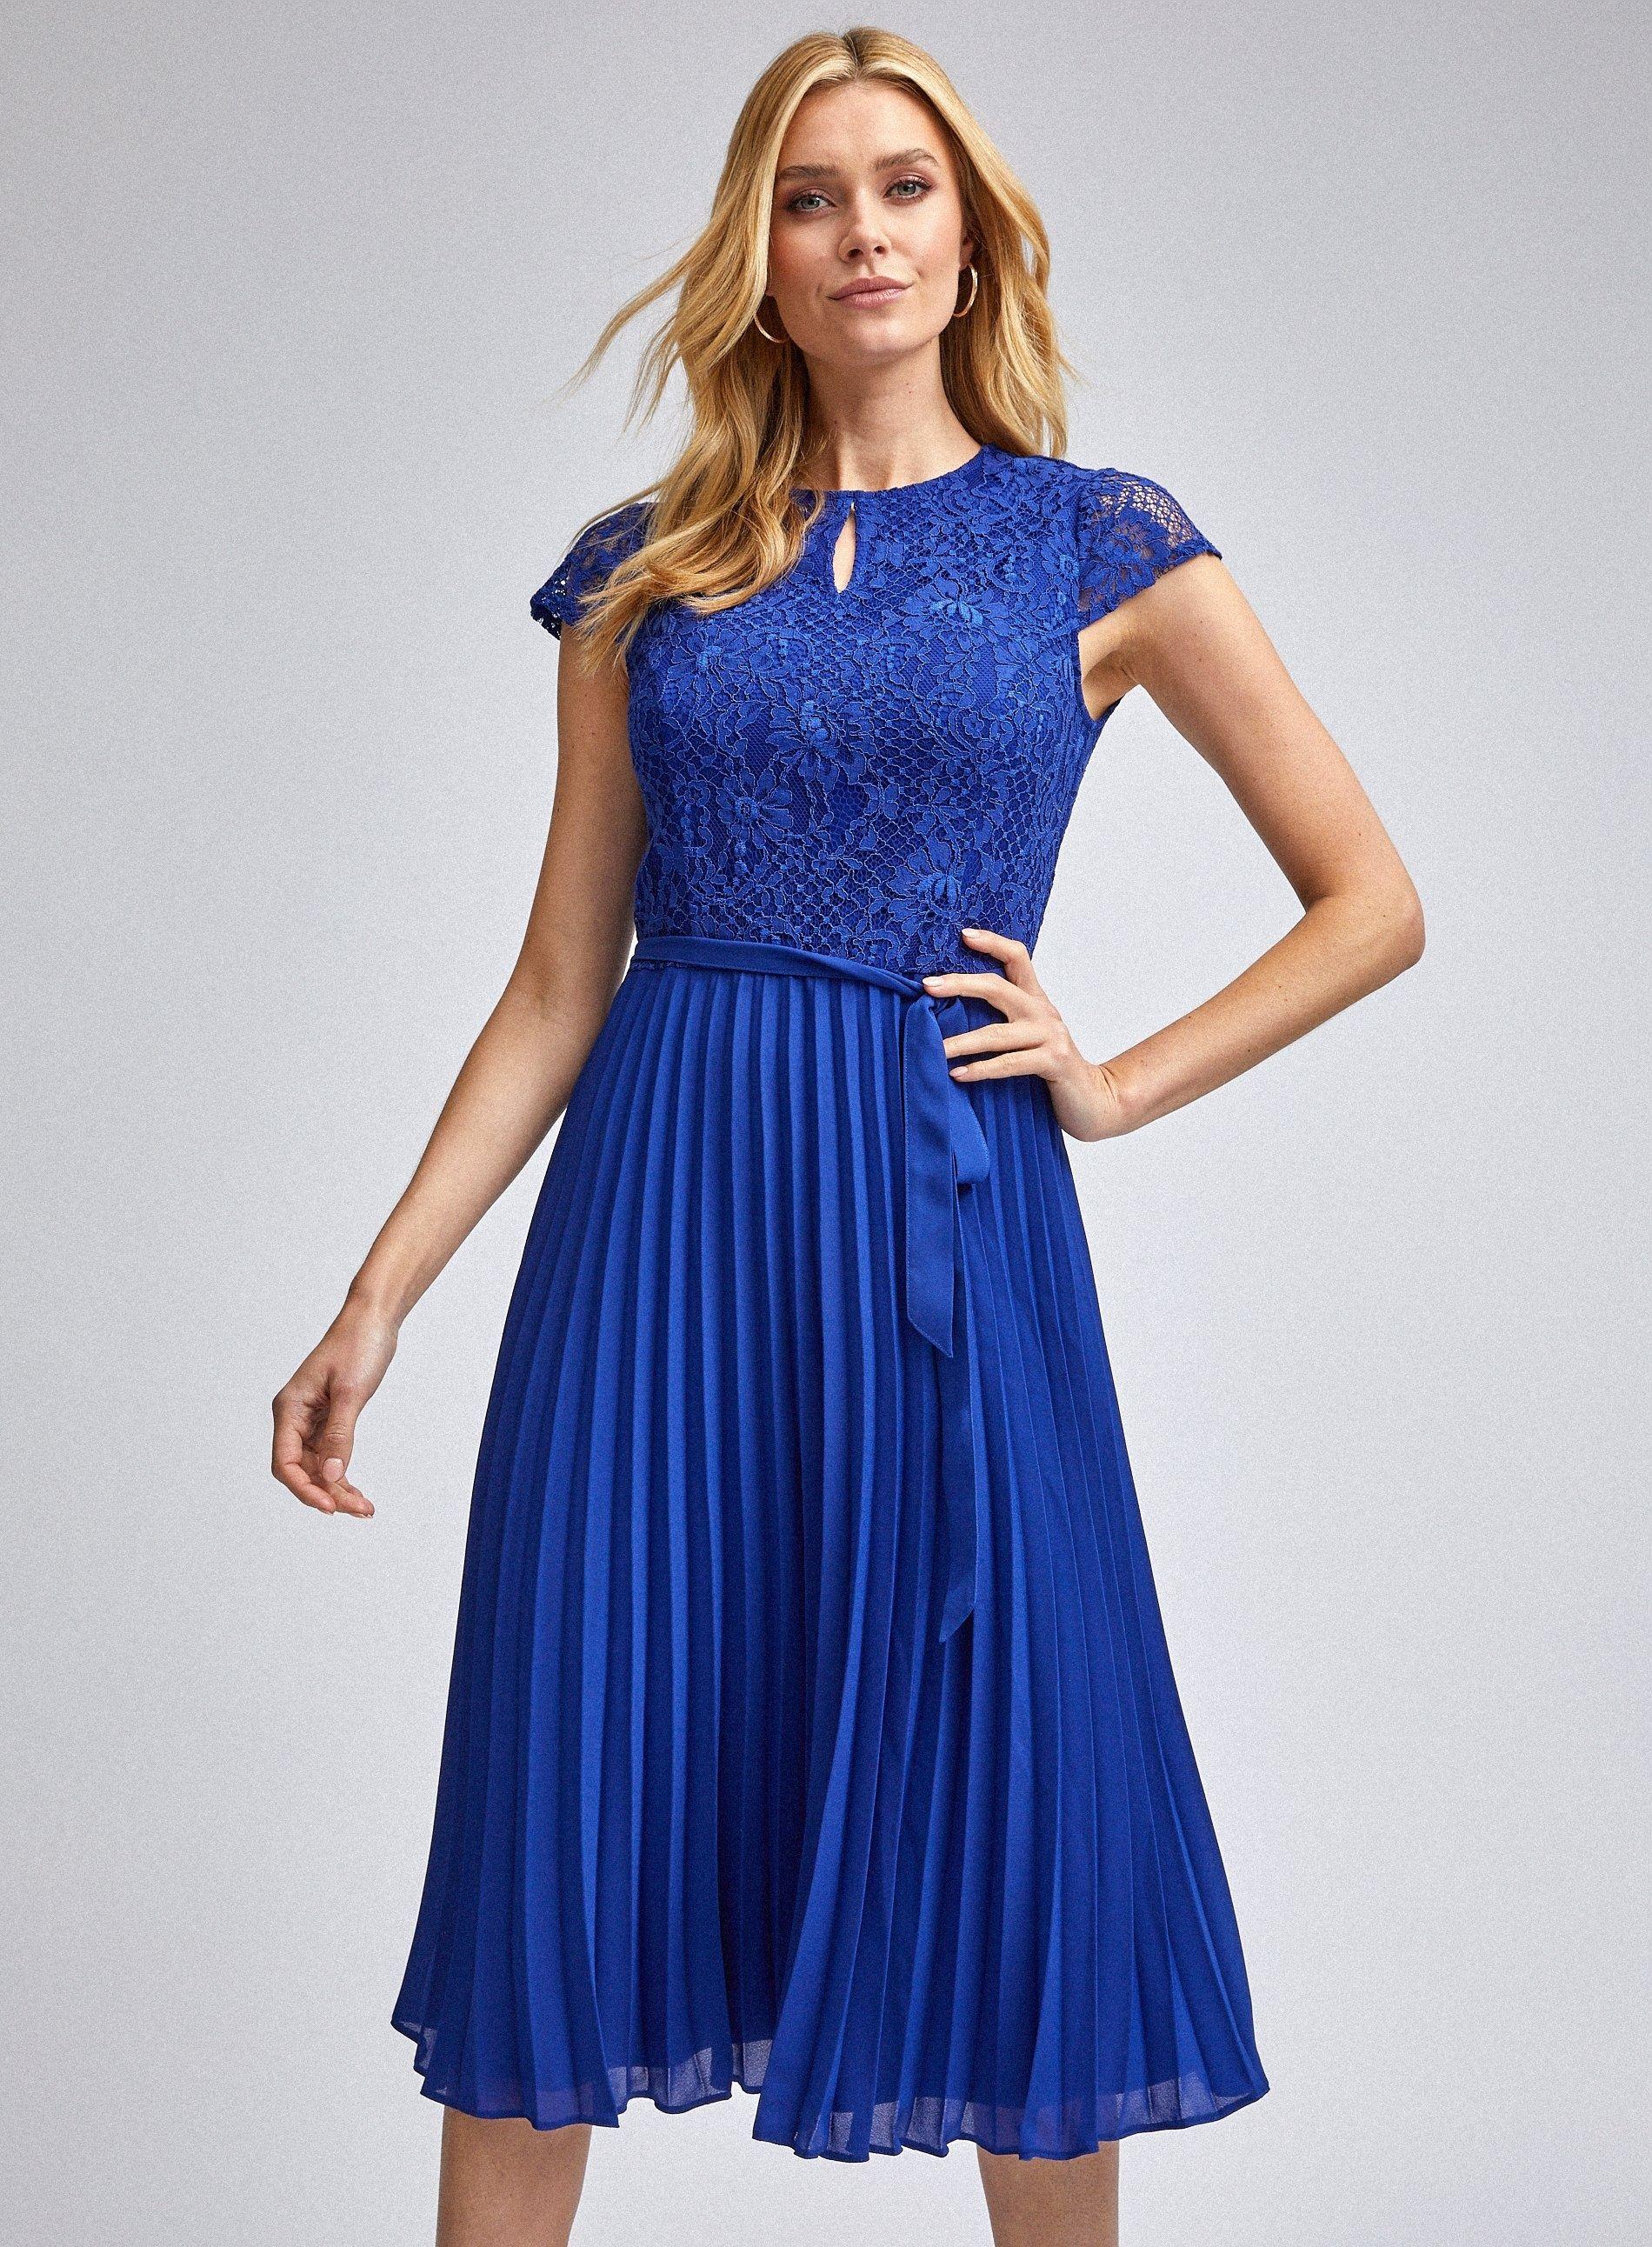 Dorothy Perkins Womens Blue Pleat Alice Lace Midi Dress Short Sleeve Round Neck